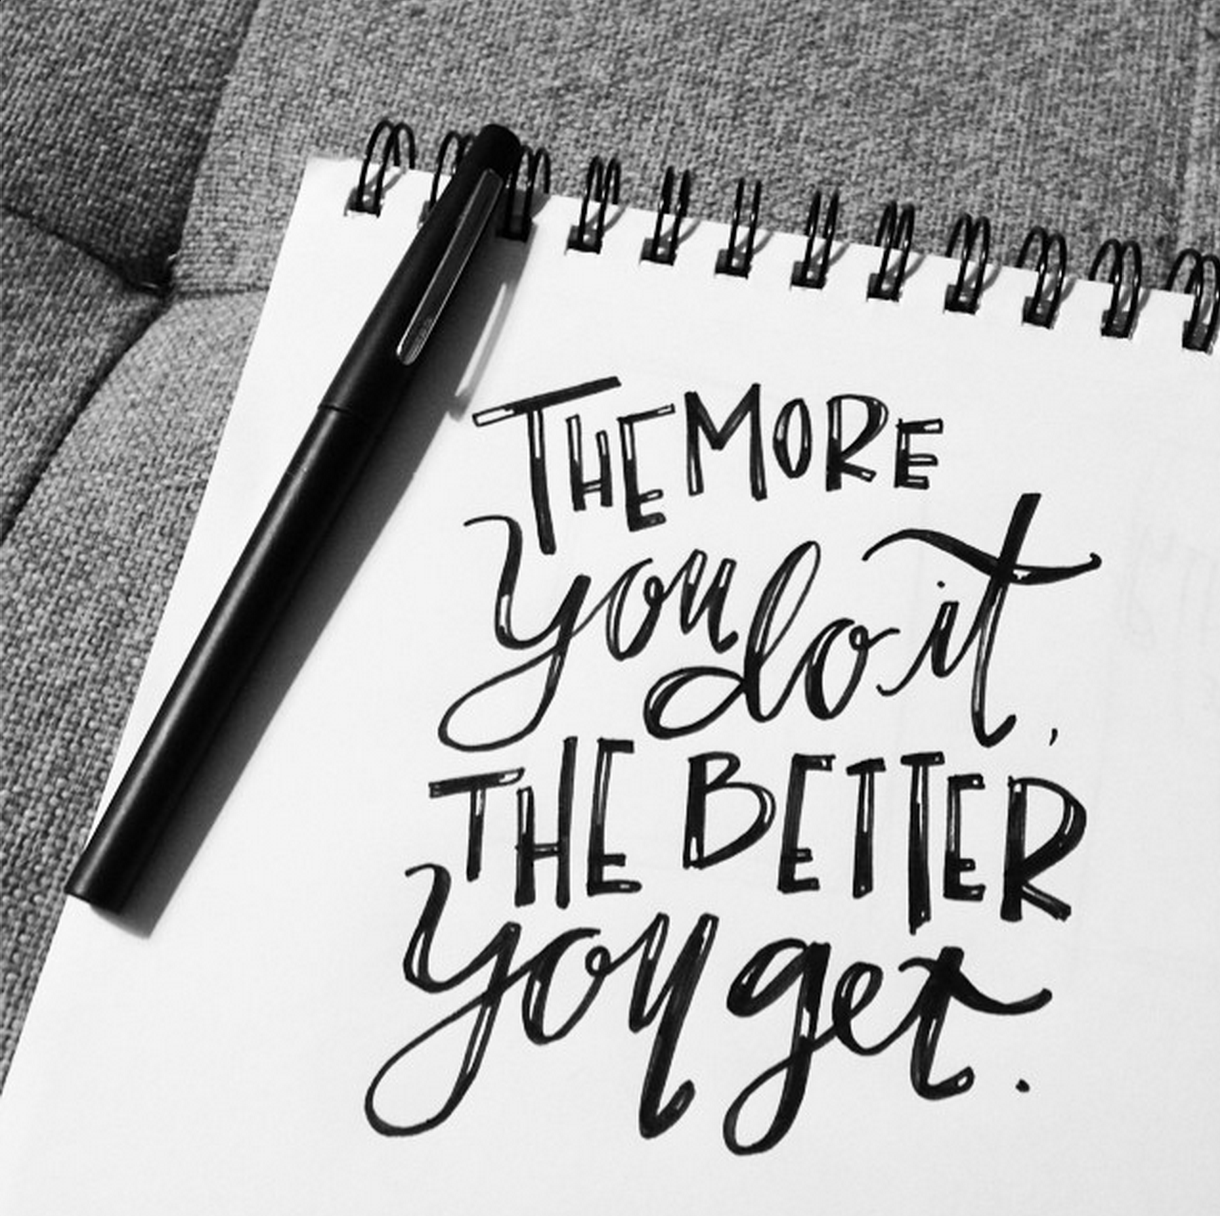 Hand-lettered sketch